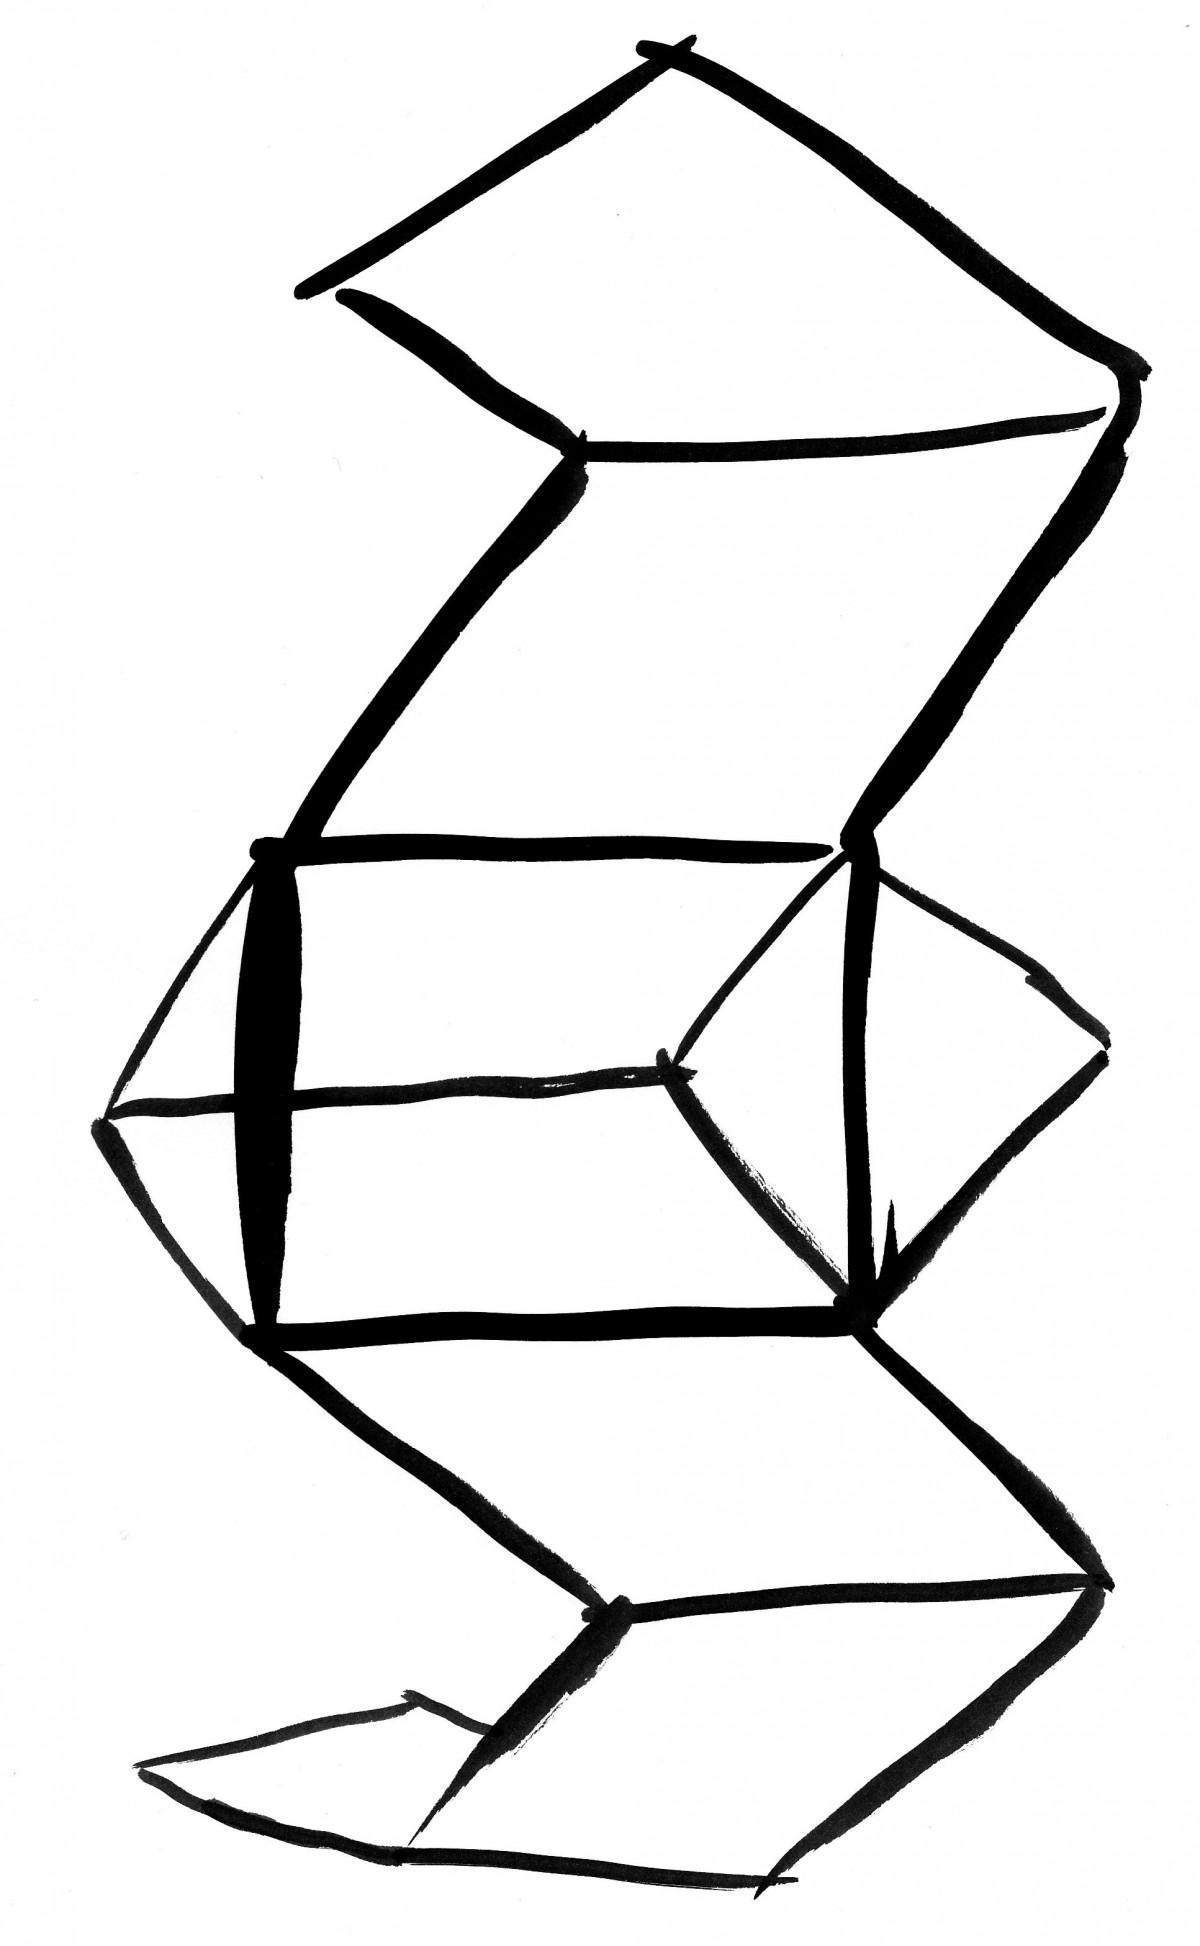 Les Carnets de Syntone, explose, dessin : Rosalie Peeters